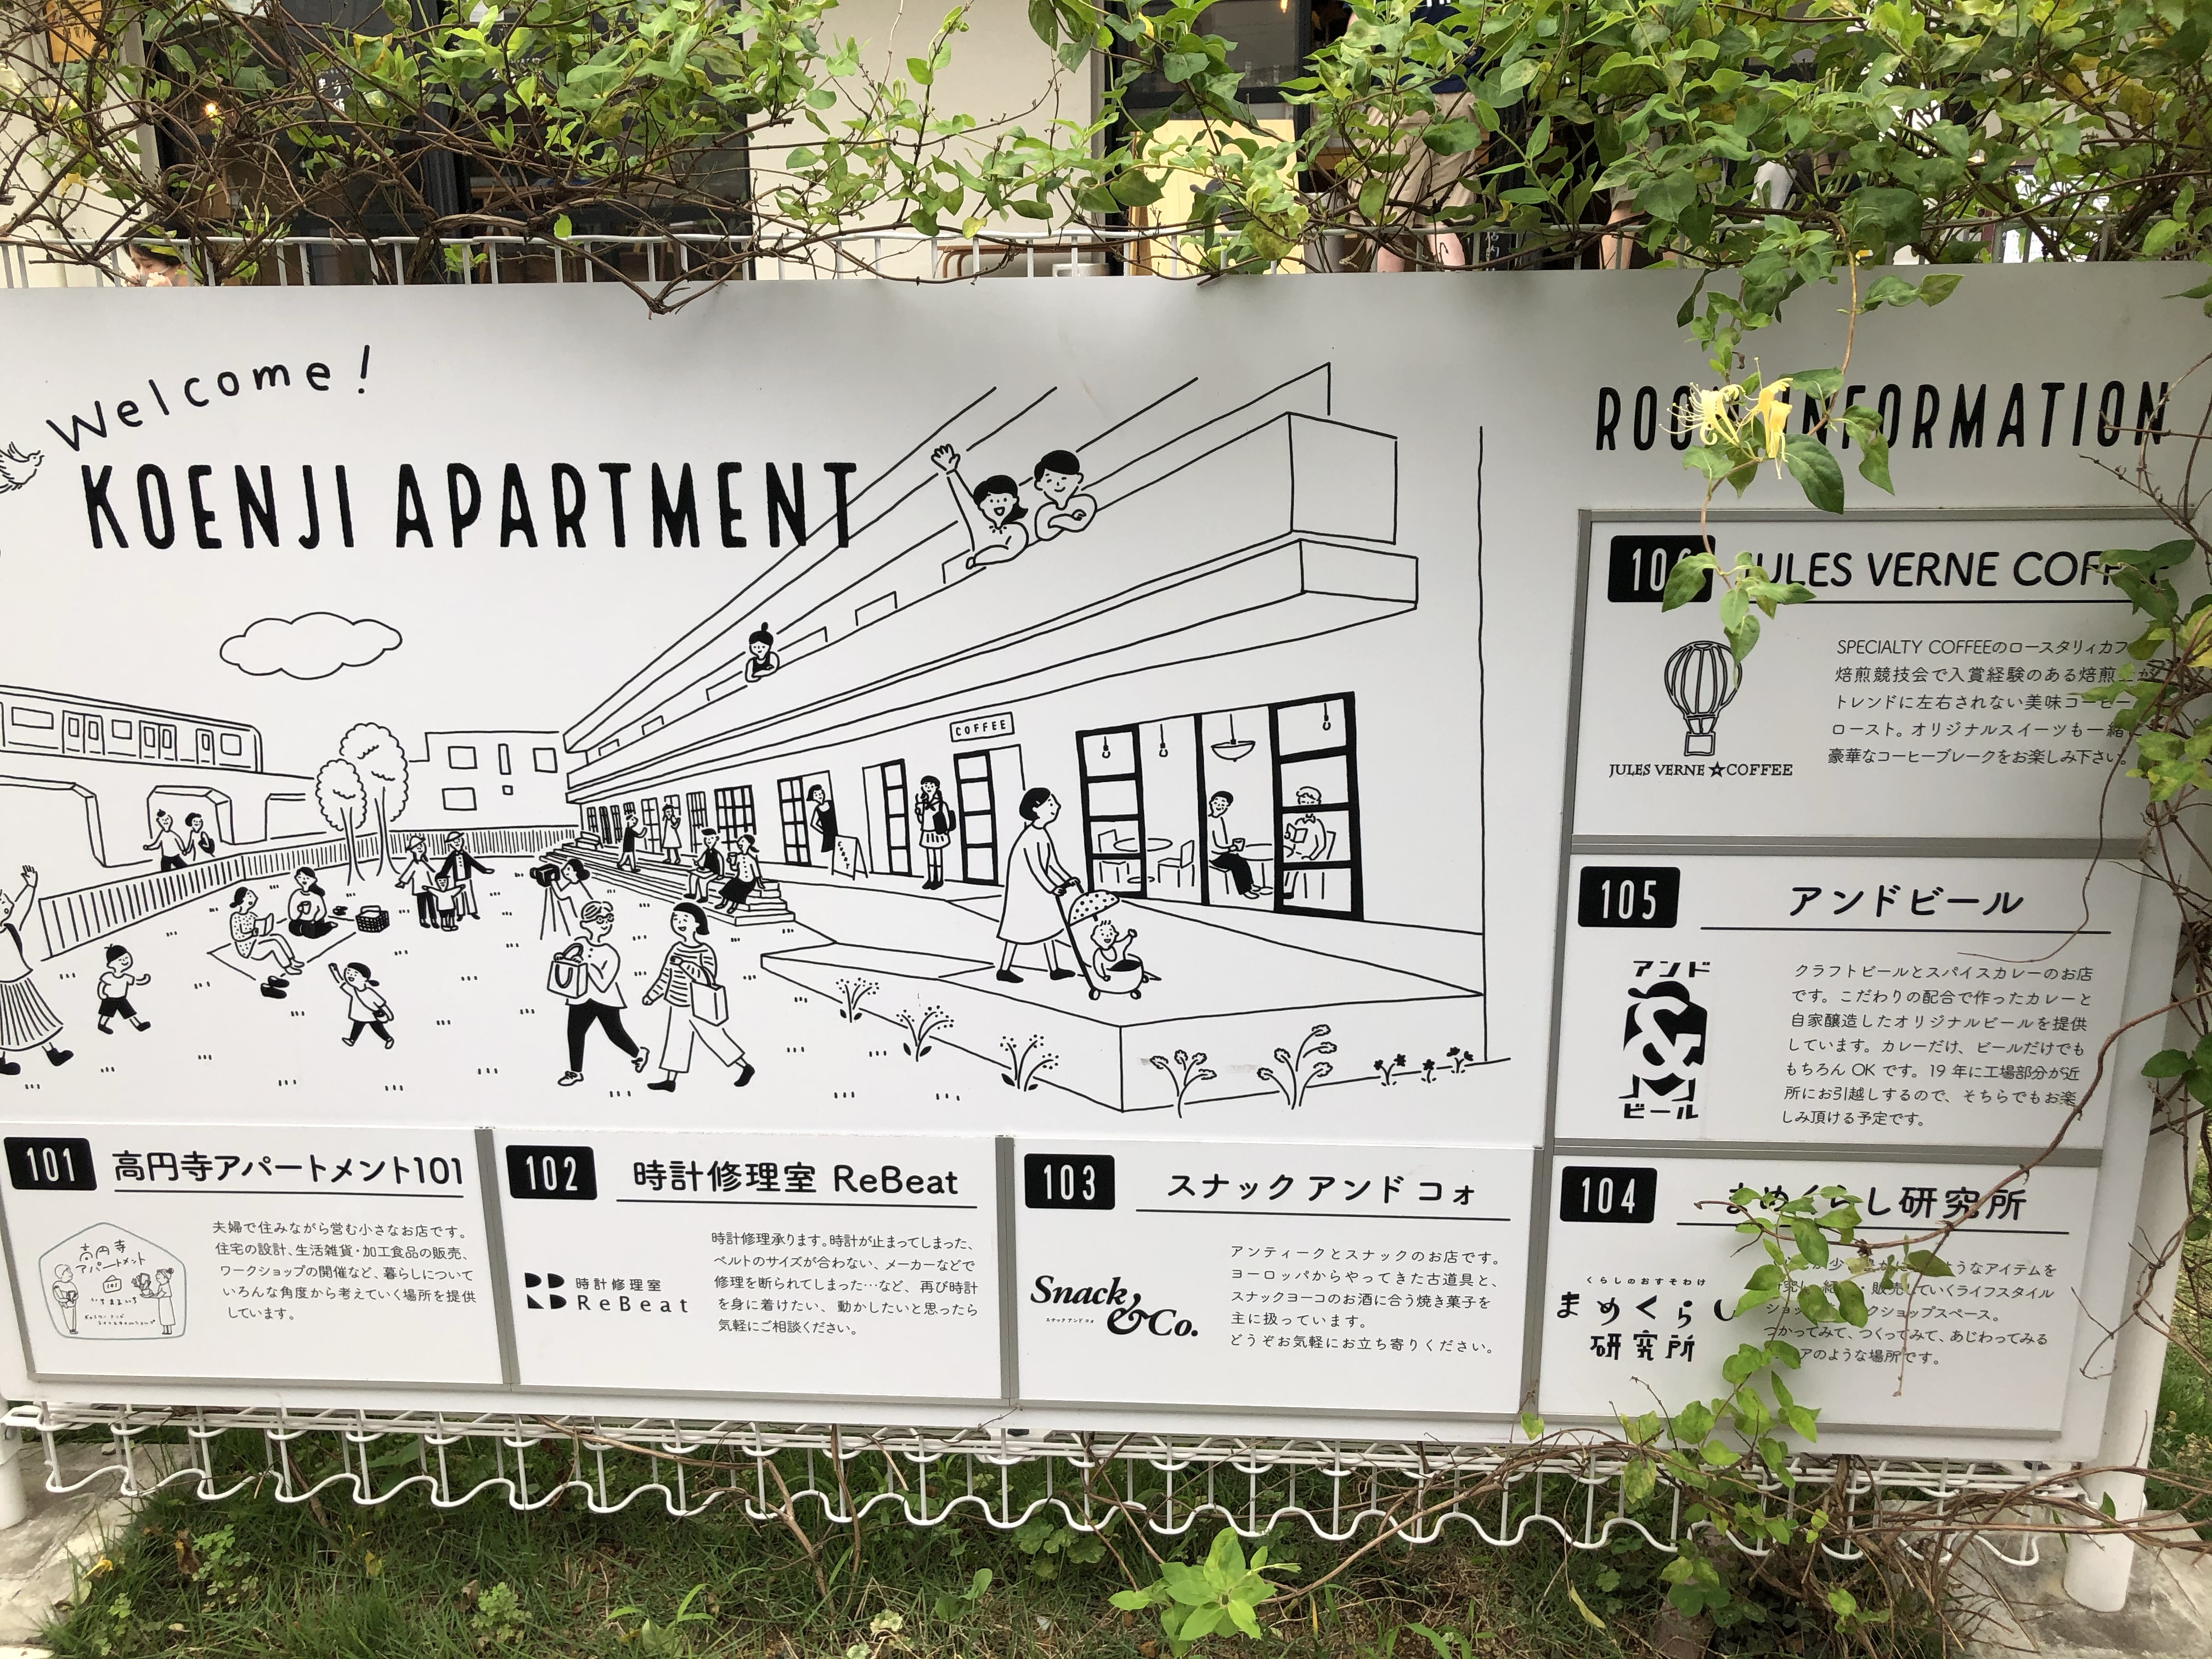 KOENJI APARTMENTの看板